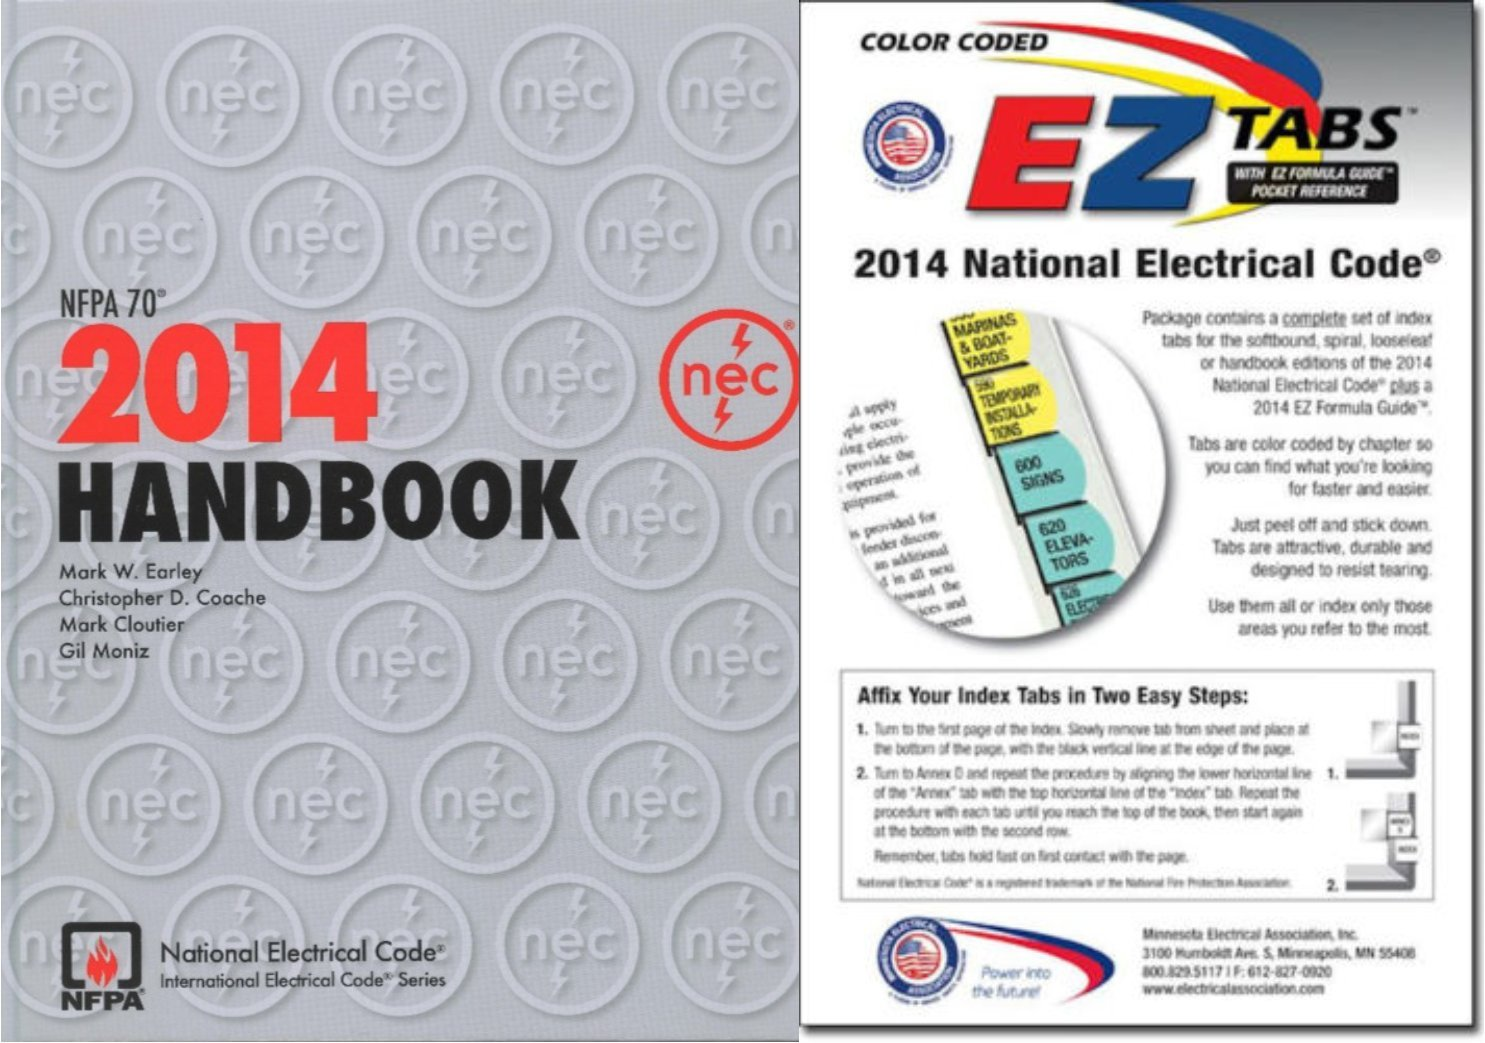 Amazon.com: NFPA 70: National Electrical Code (NEC) Handbook and EZ ...